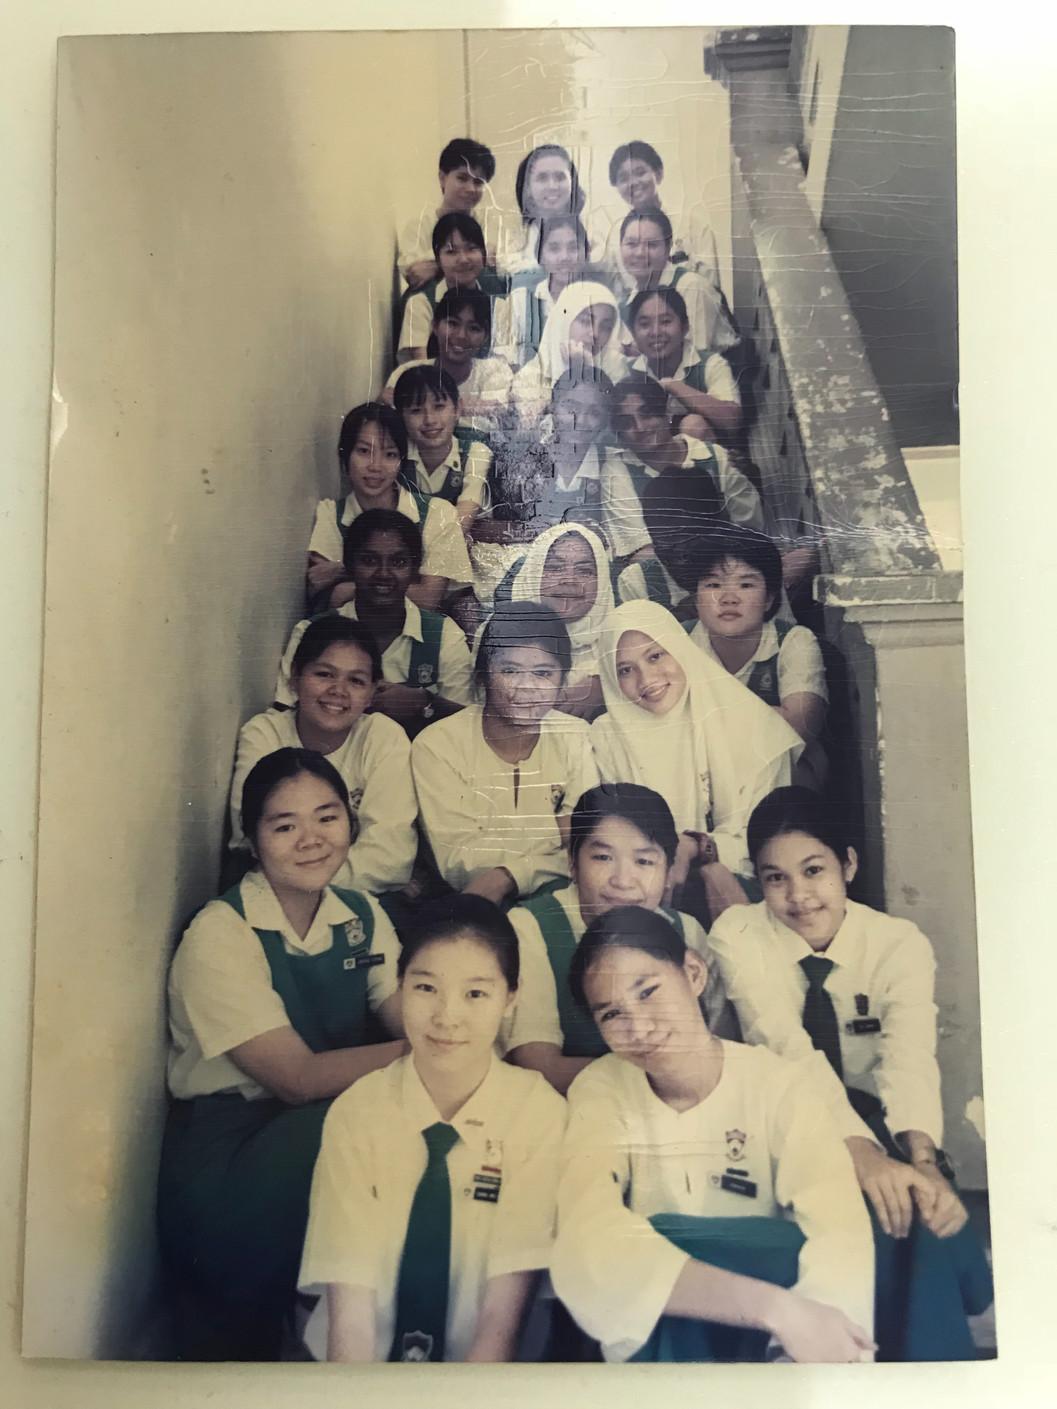 The Ketua-Ketua Gang of a Girls' School: My Story